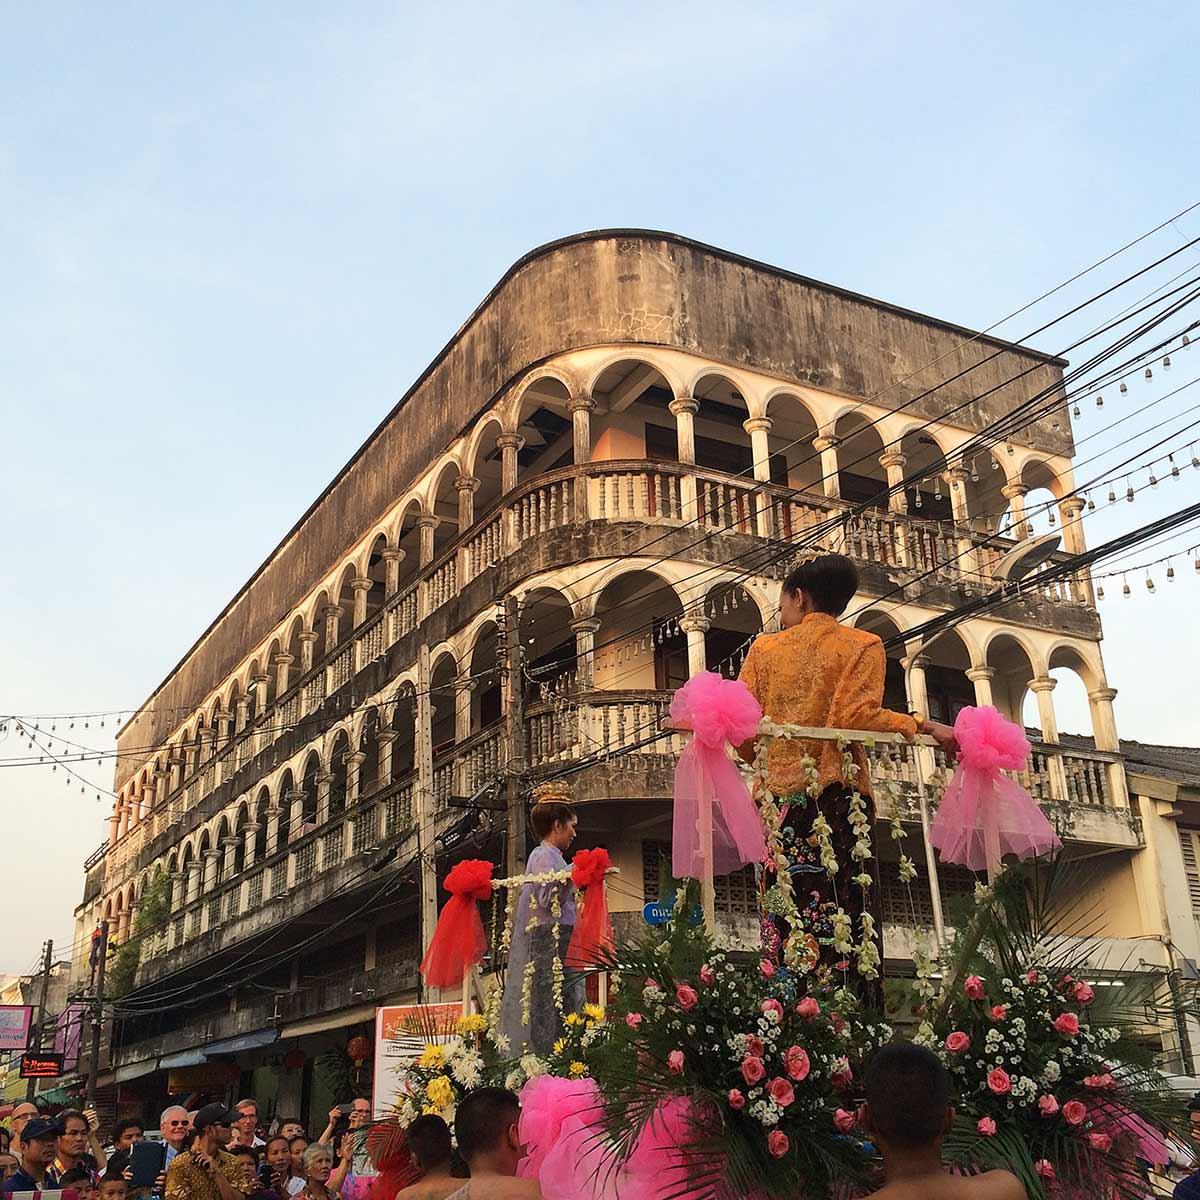 Phuket Old Town, Çin yeni yıl festivali. Live Love Thank